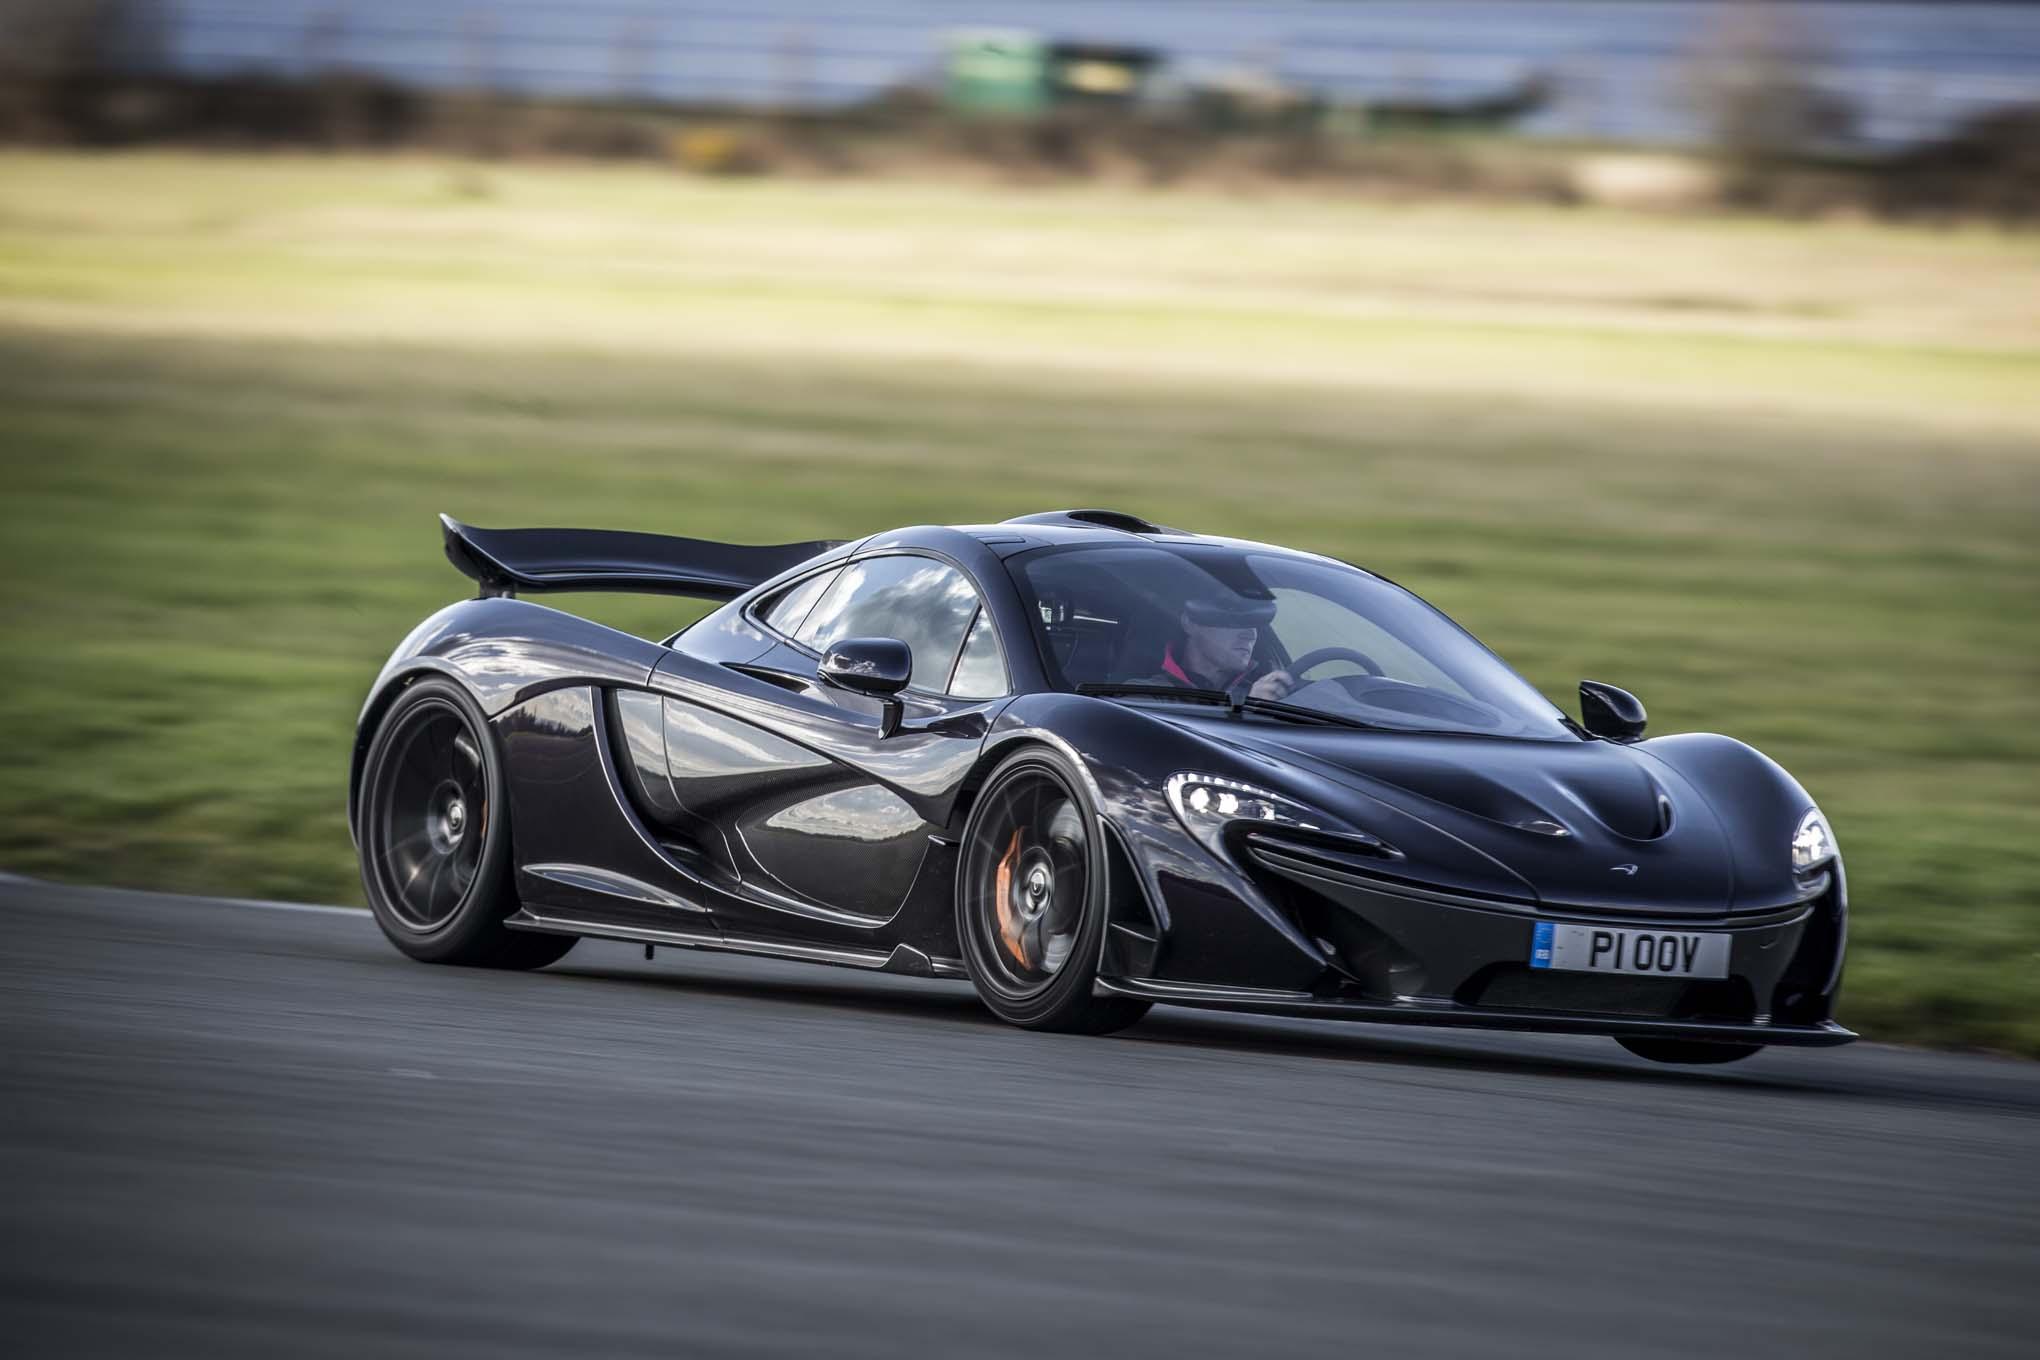 http://st.automobilemag.com/uploads/sites/11/2014/03/2014-Mclaren-P1-black-front-three-quarter-in-motion-10.jpg